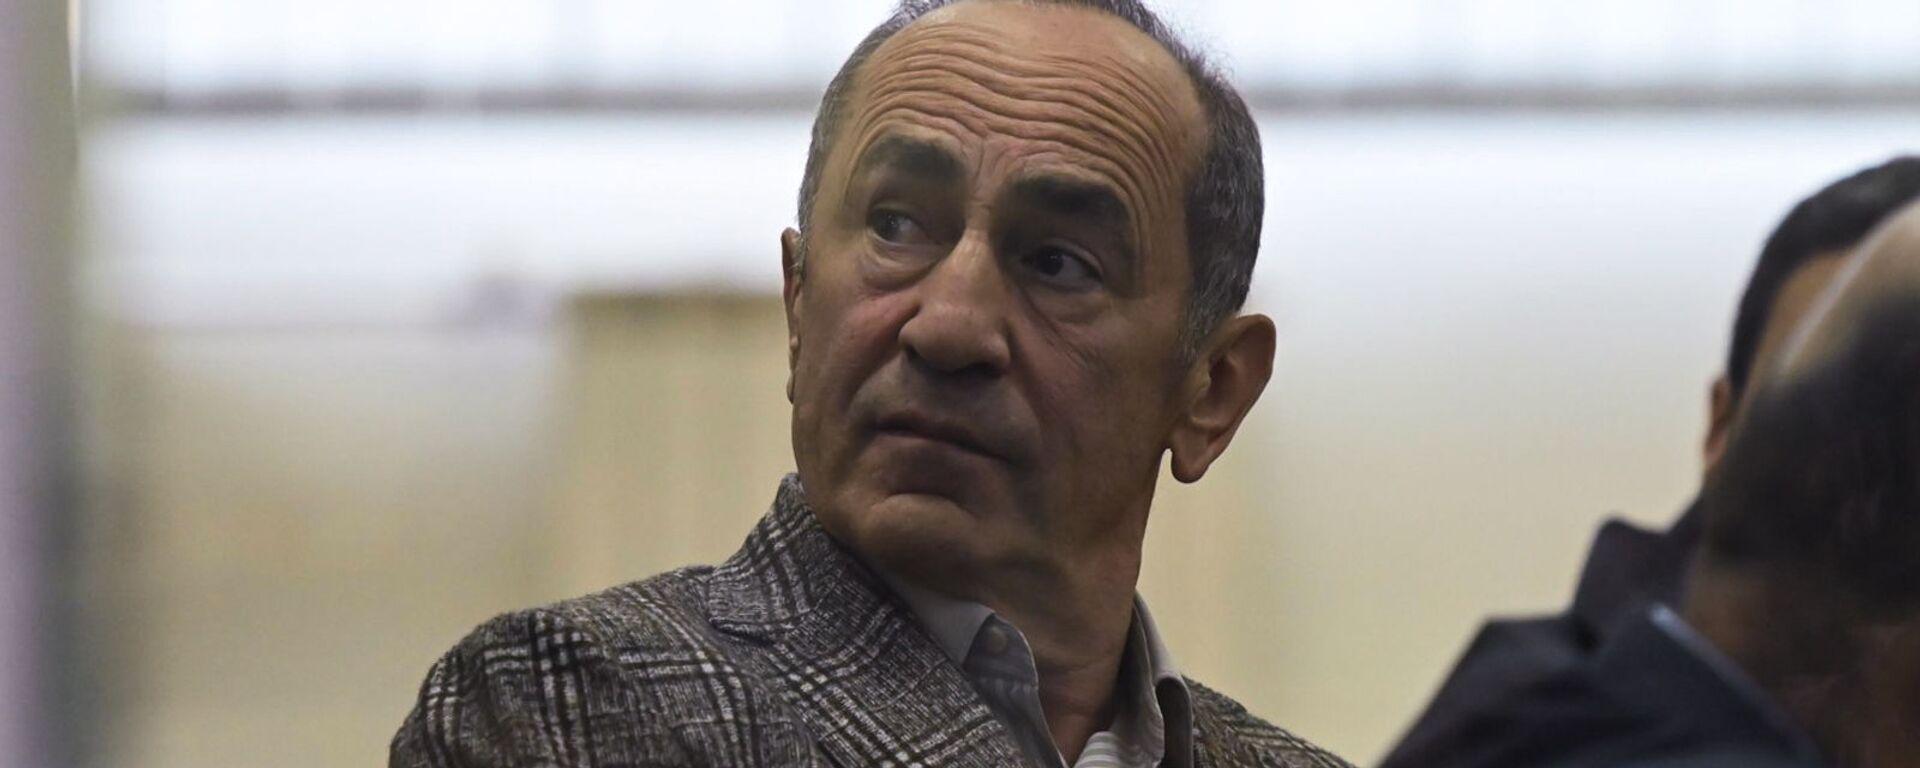 Роберт Кочарян в зале Шенгавитского суда (2 февраля 2021). Еревaн - Sputnik Армения, 1920, 28.09.2021